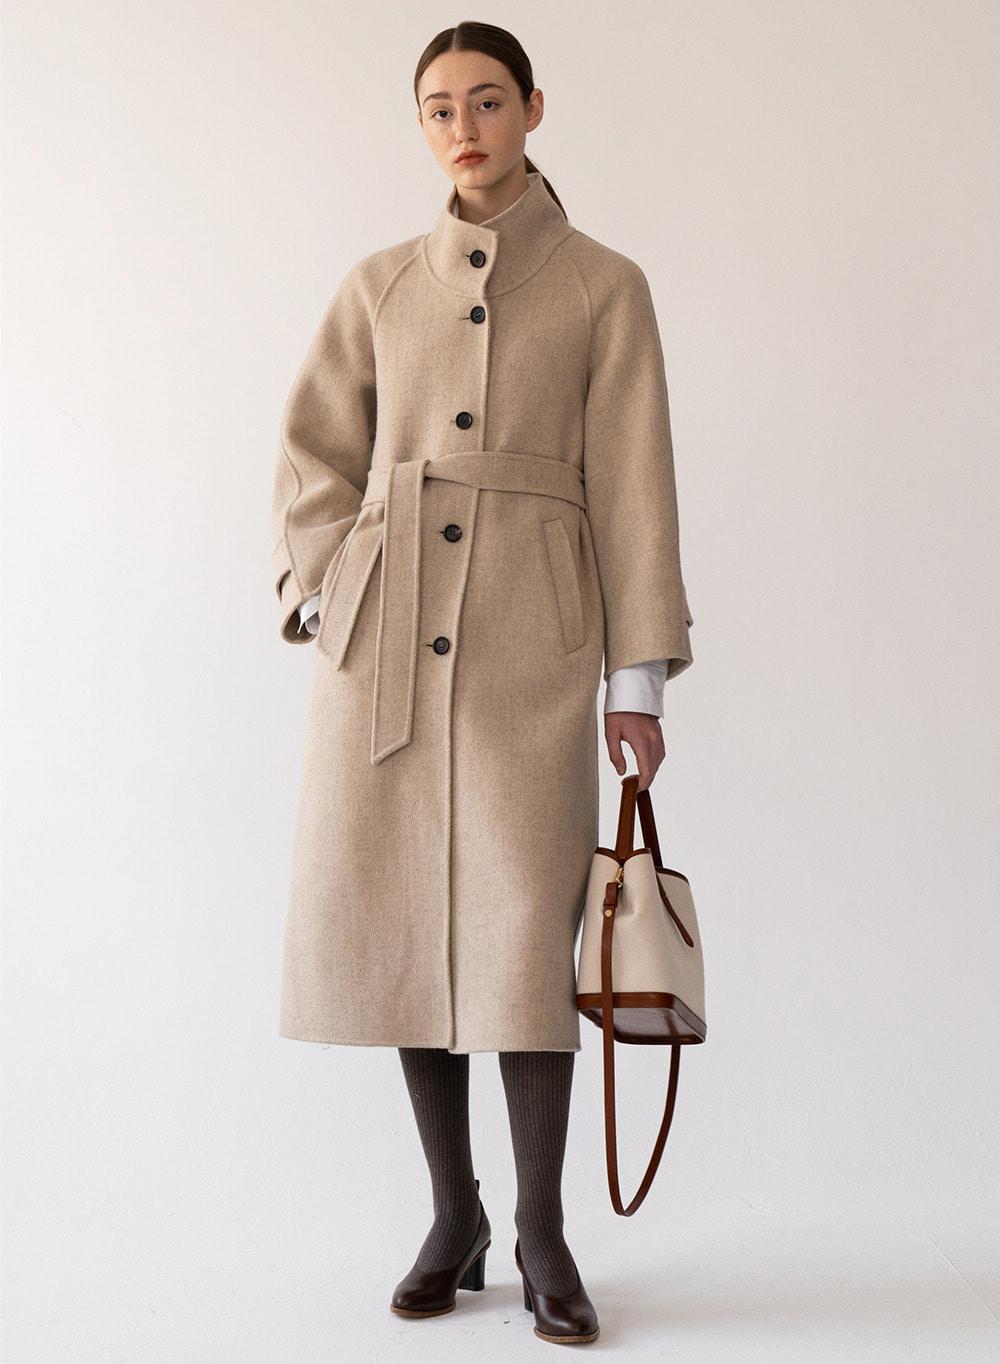 [FW20 ESSENTIAL] High Neck Handmade Coat Taupe-melange